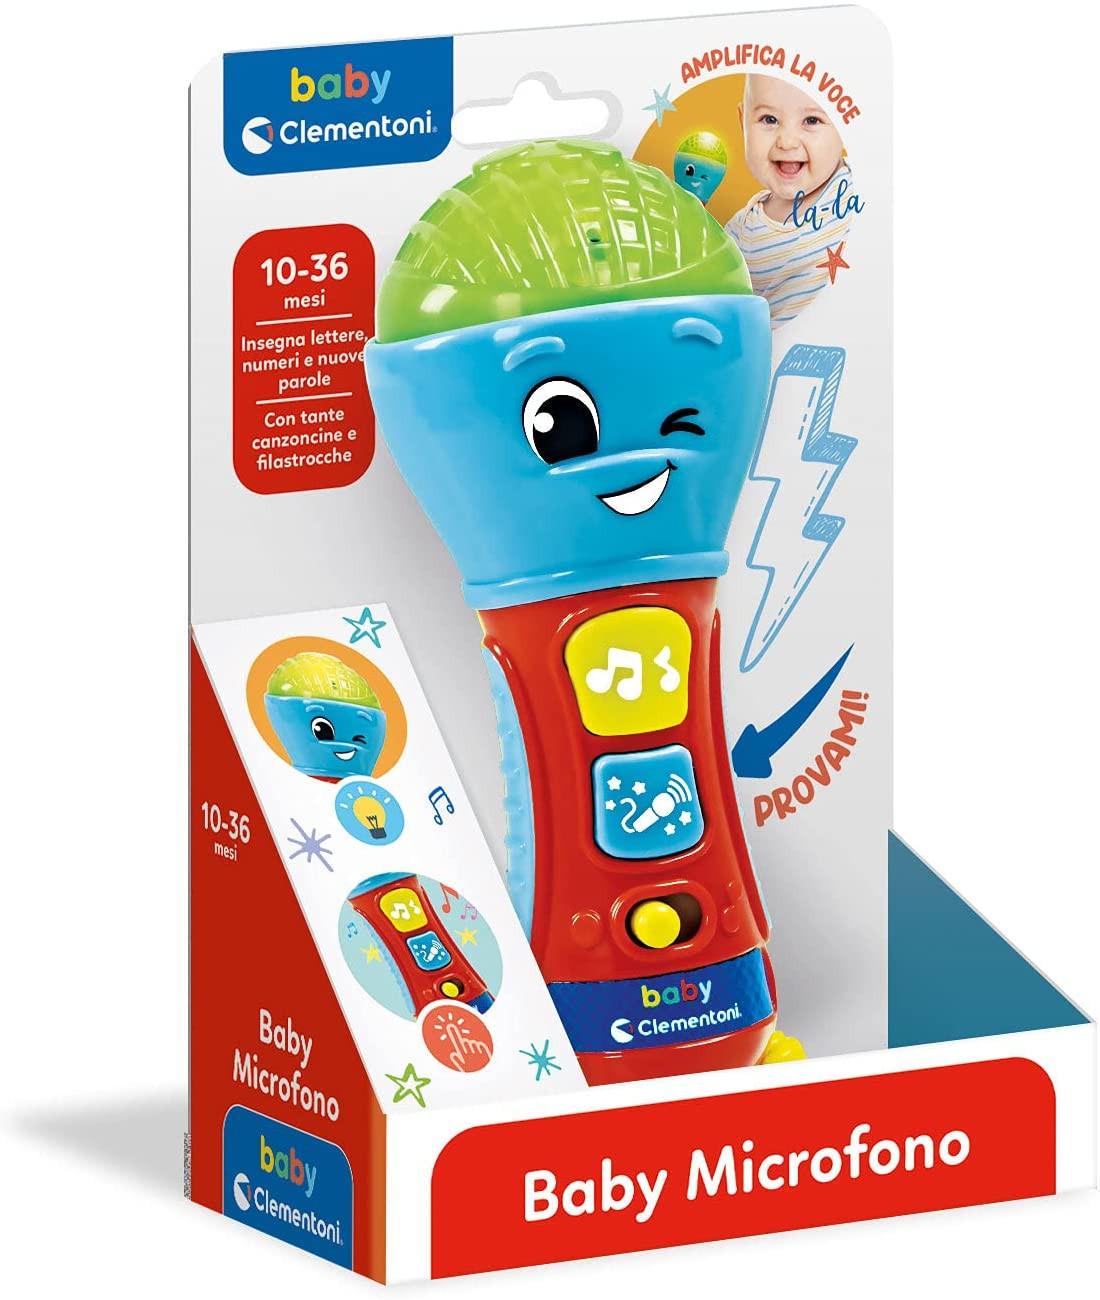 Baby Microfono Clementoni